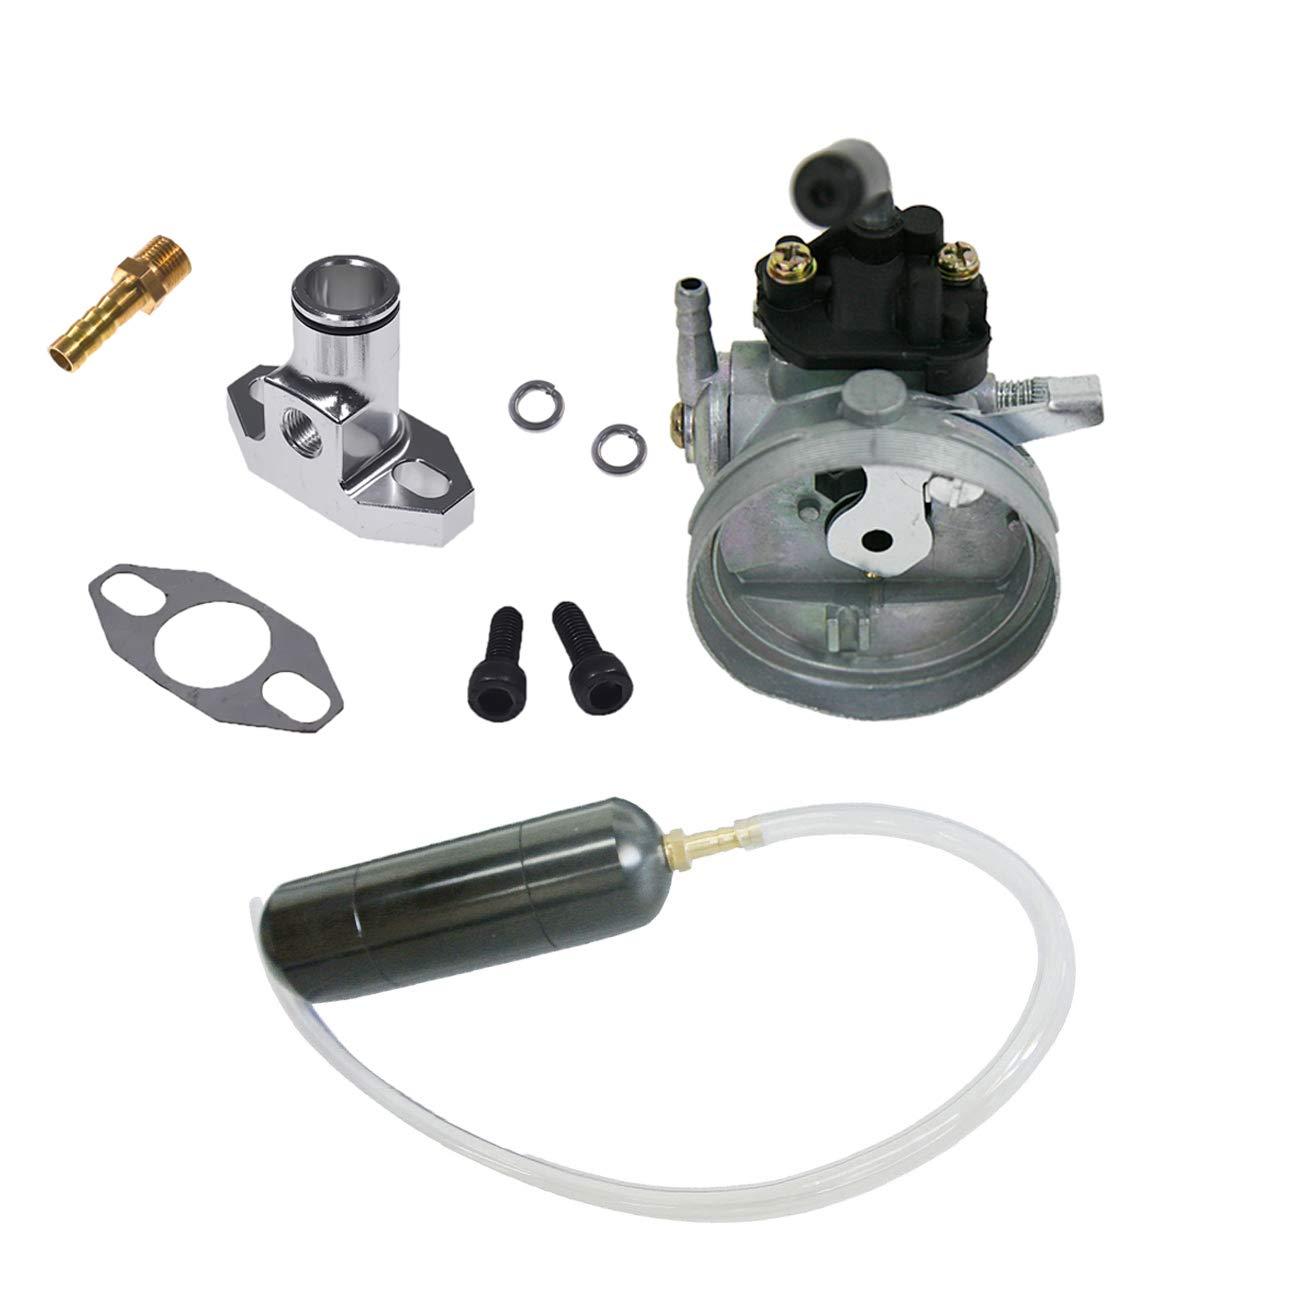 NORTHTIGER Carburetor&Black Gas Power Boost Bottle for 66cc 80cc Engine Motorized Bicycle